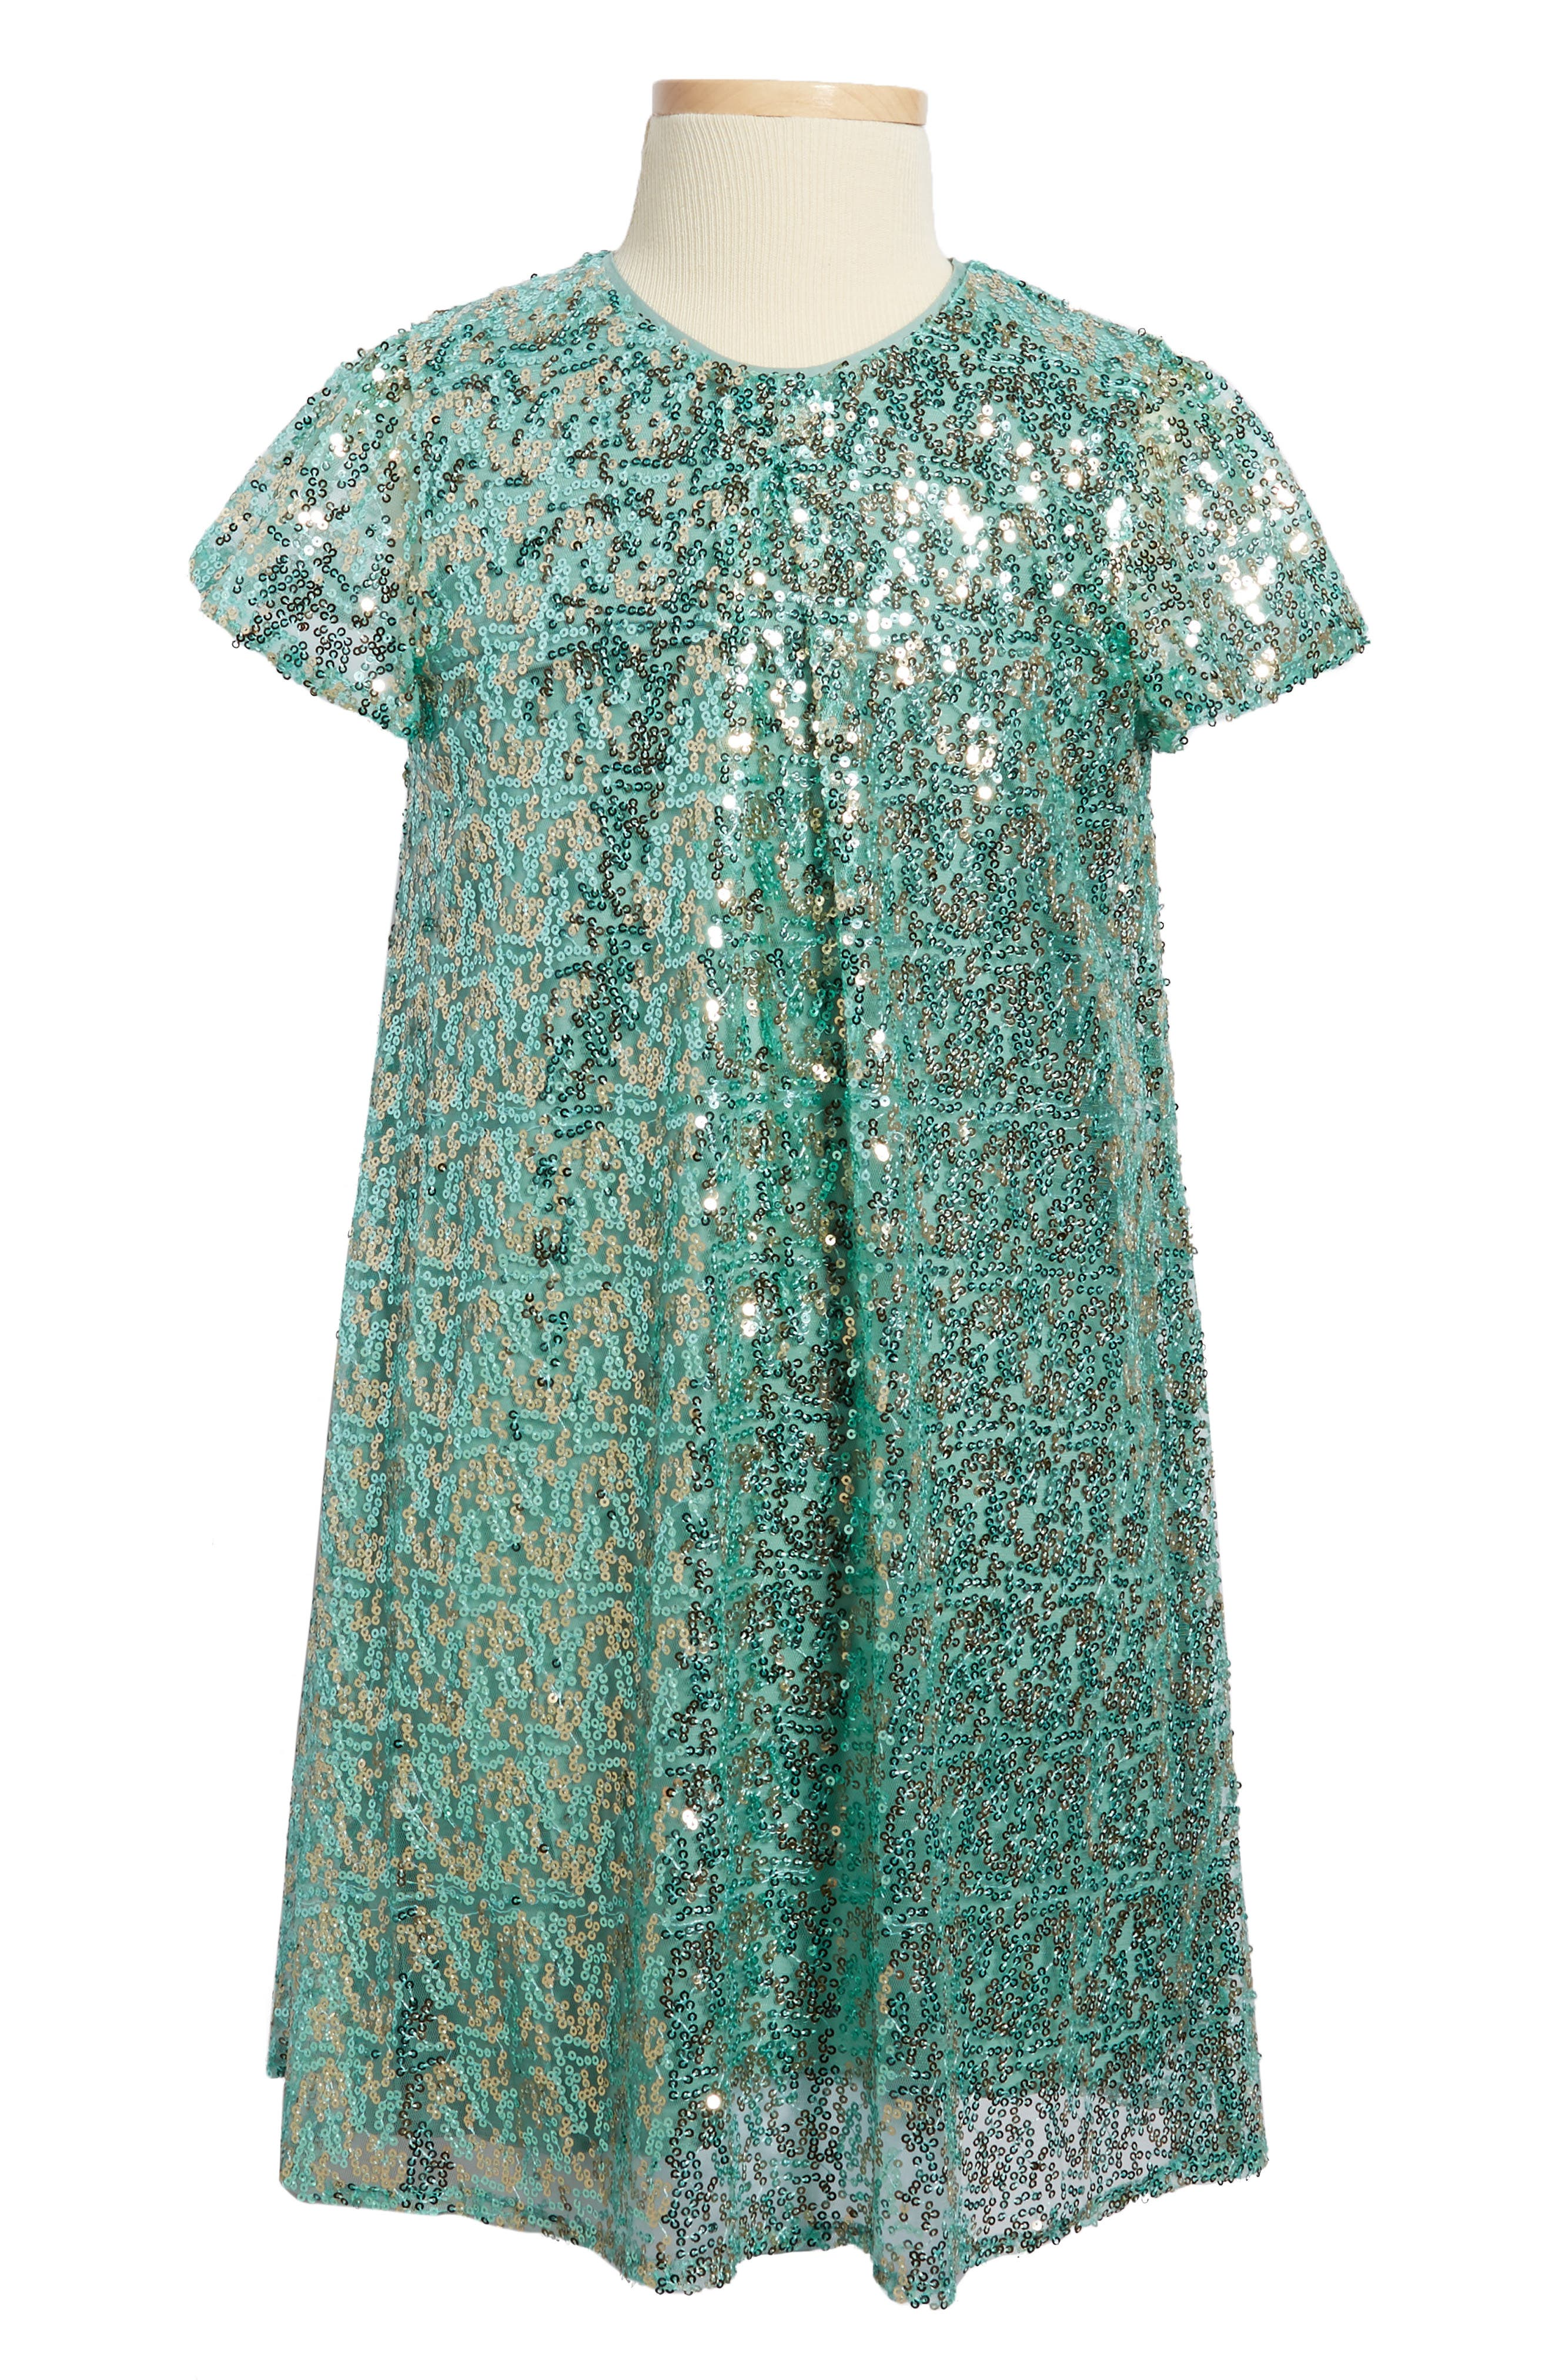 Main Image - Wild & Gorgeous Sequin Embellished Dress (Toddler Girls, Little Girls & Big Girls)